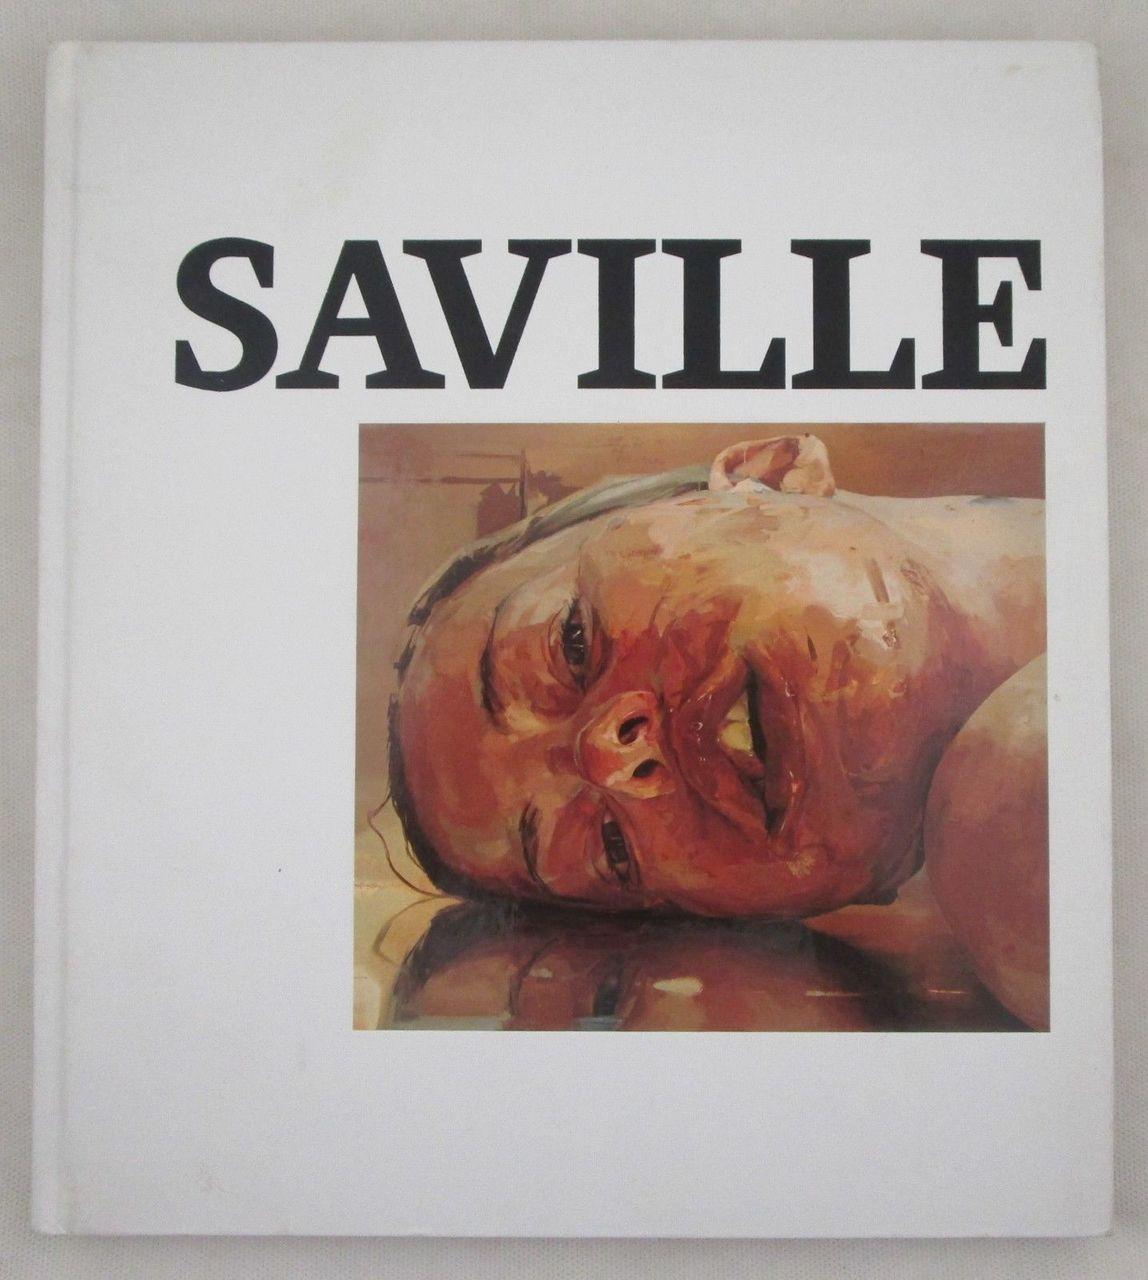 JENNY SAVILLE, by Gagosian Gallery - 2005